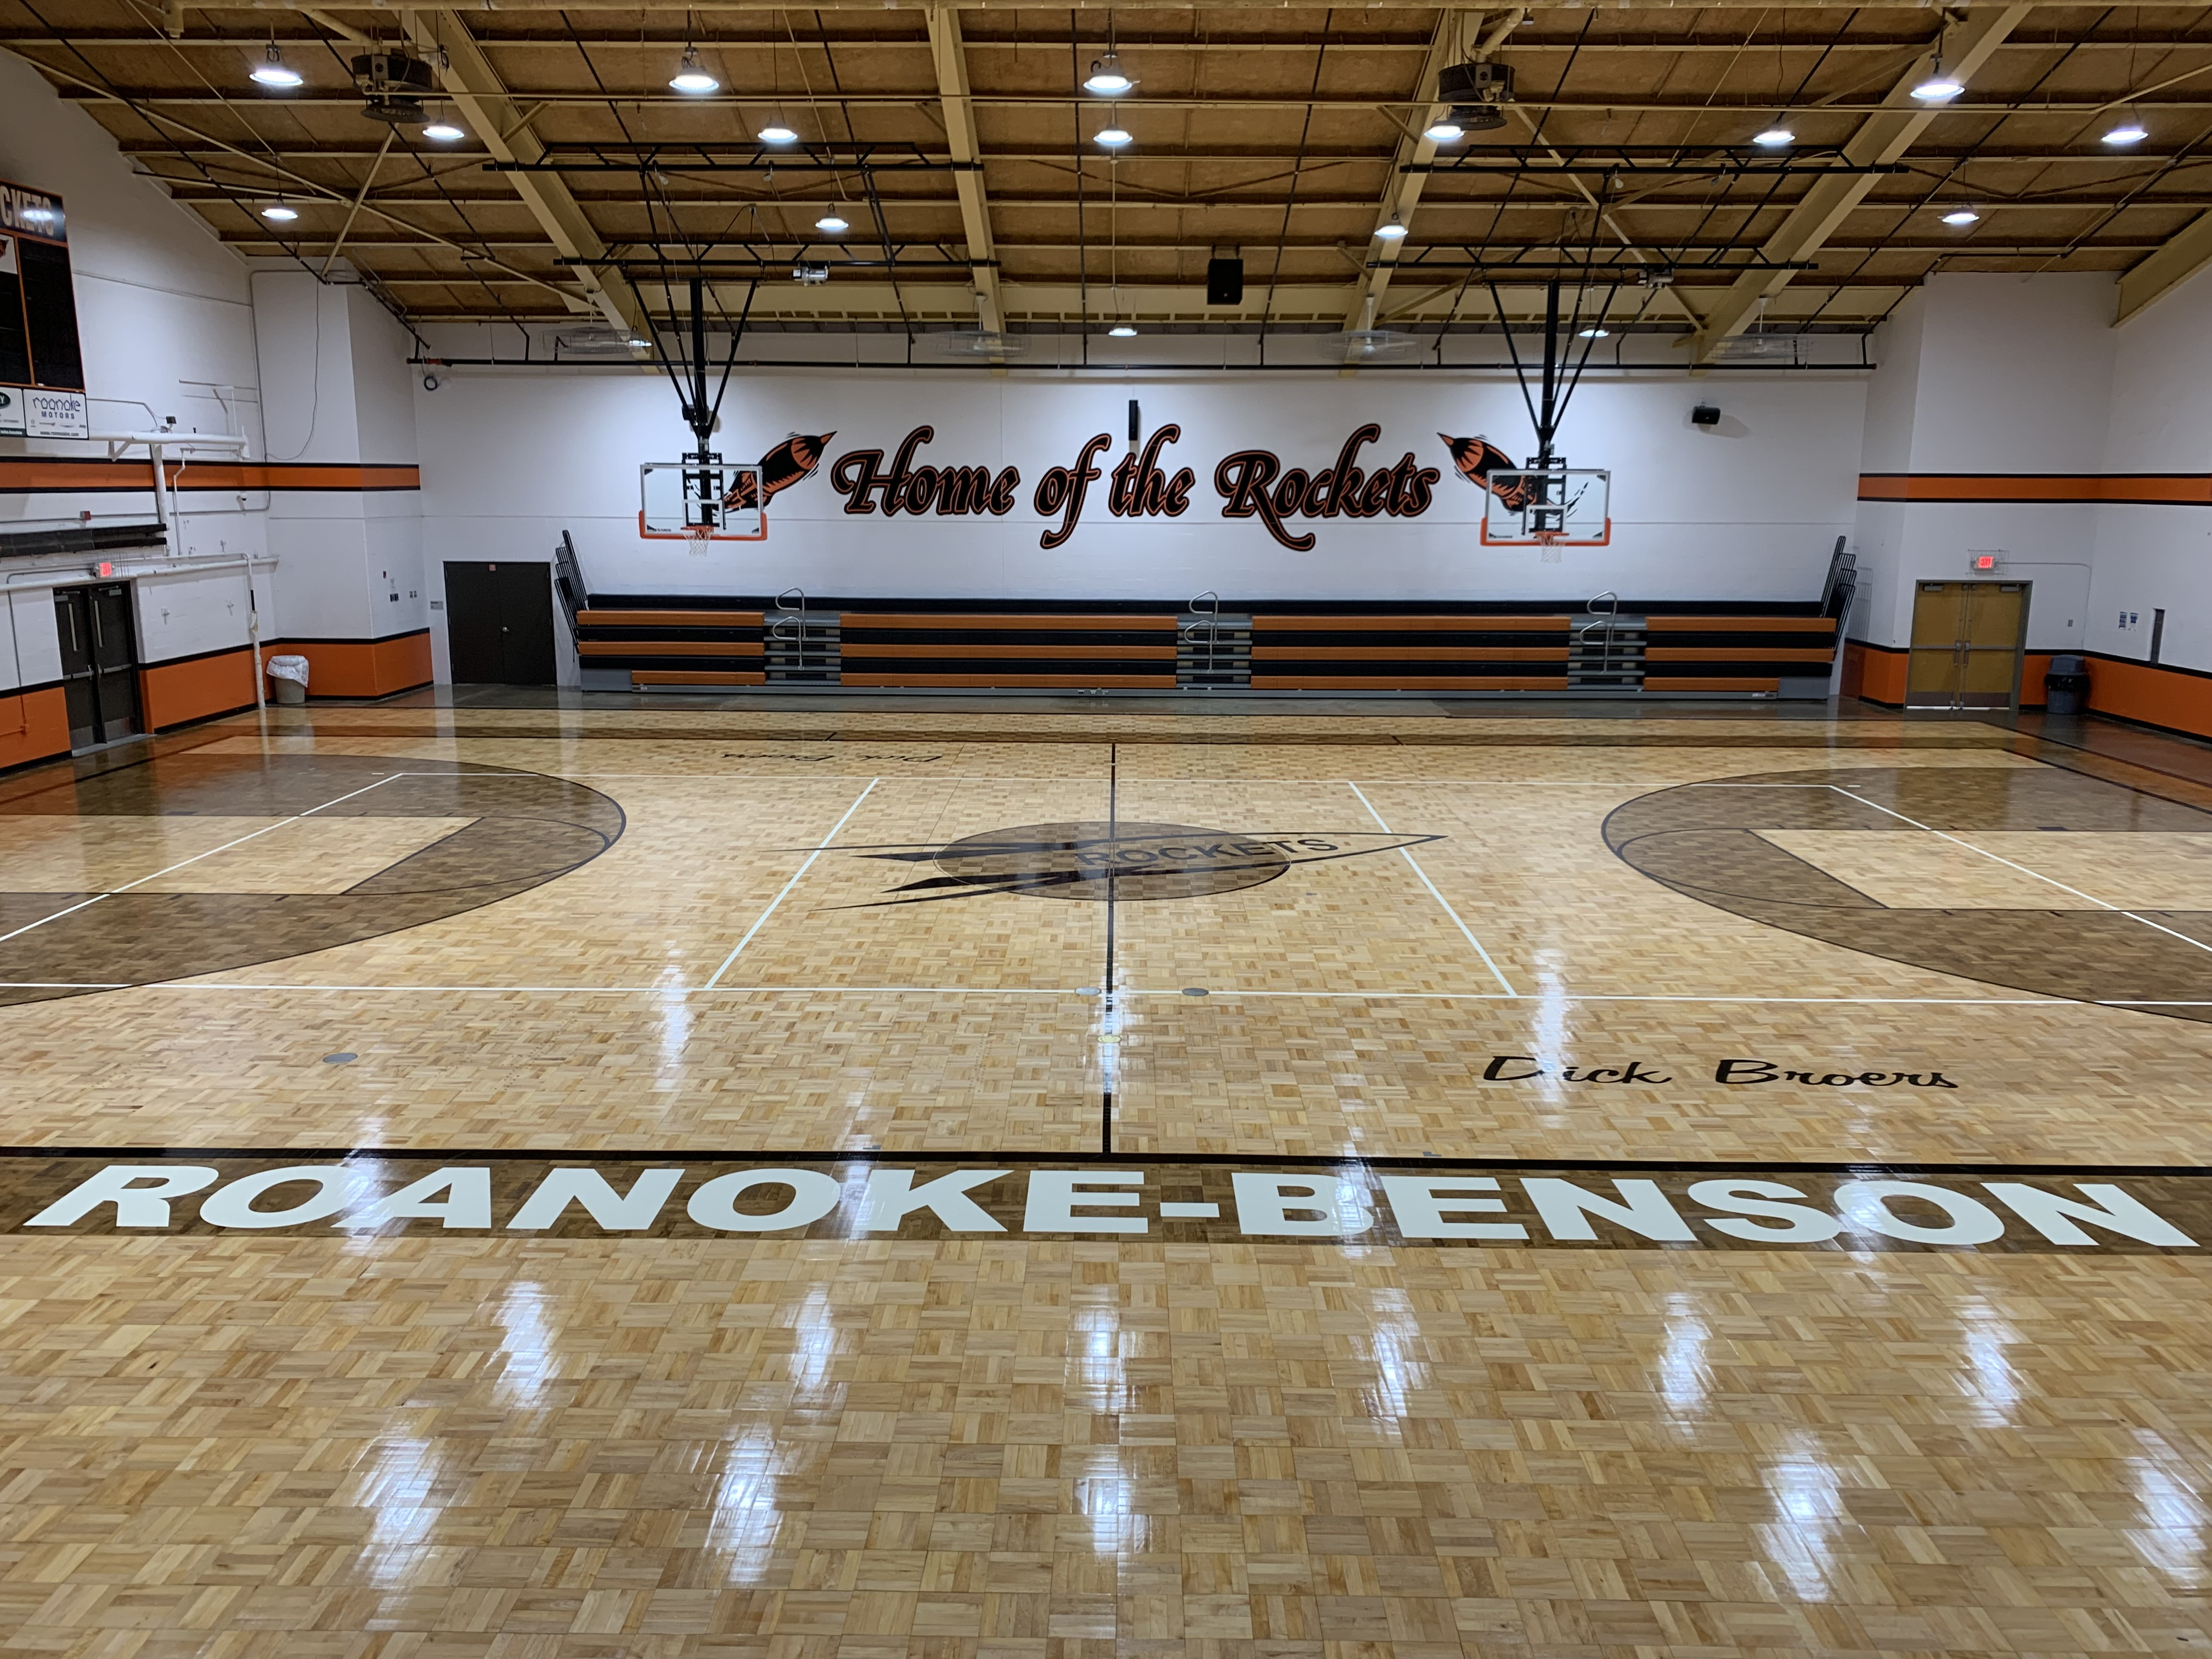 refinished gym floor